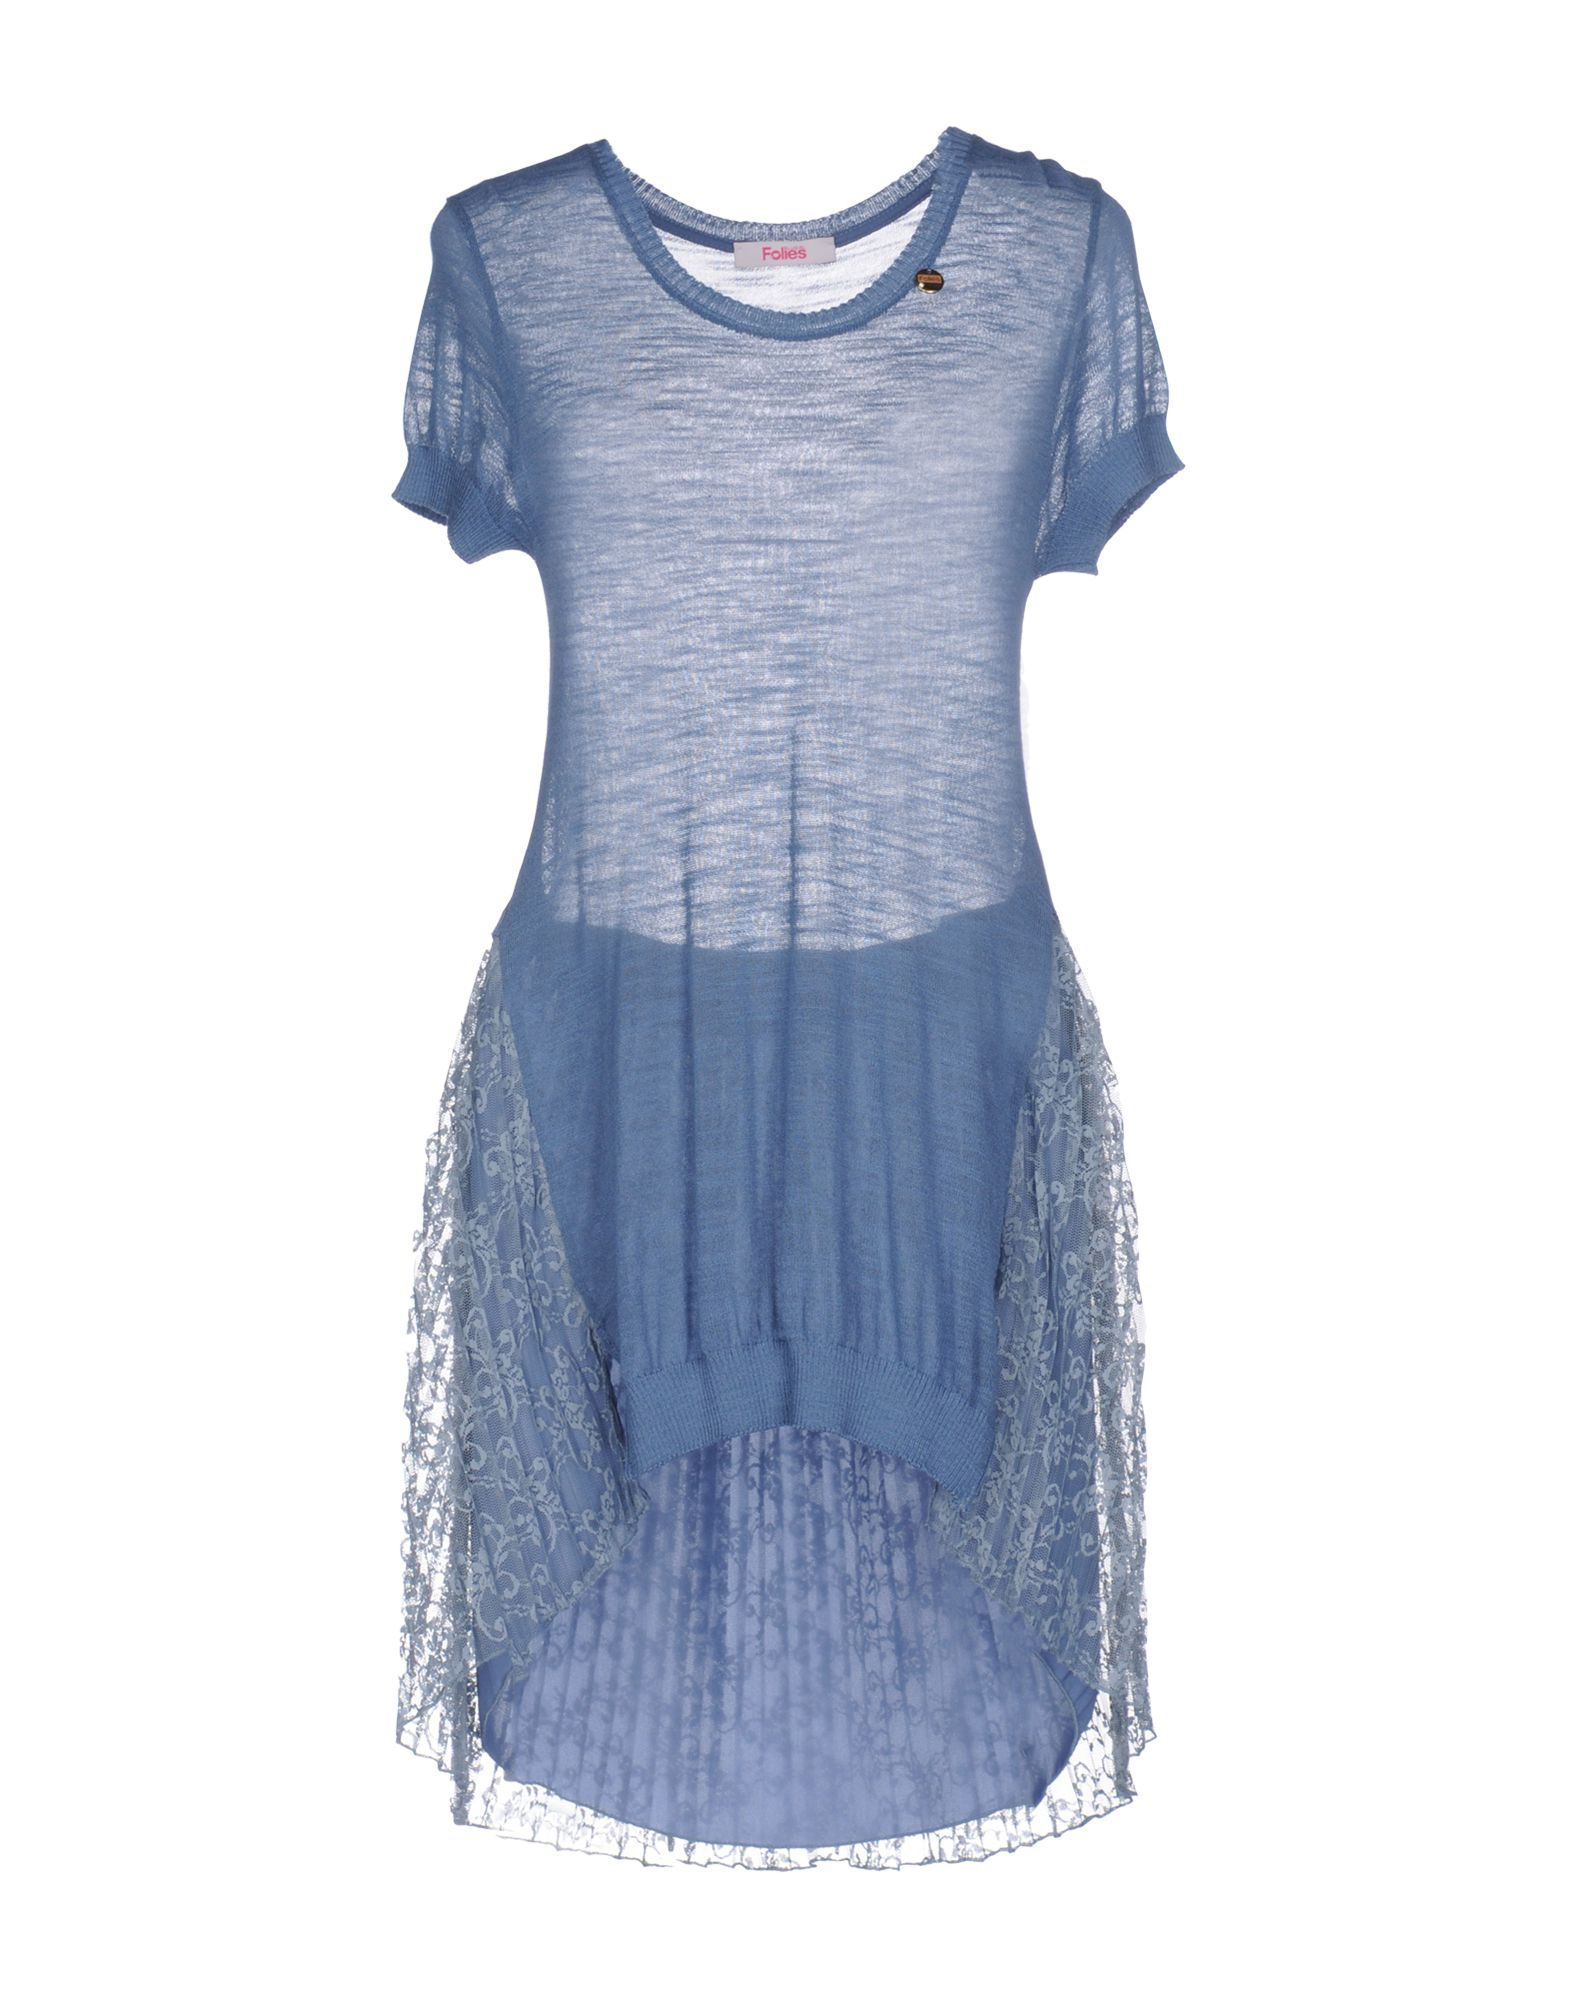 BLUGIRL FOLIES Свитер платье трикотаж blugirl folies платья и сарафаны мини короткие